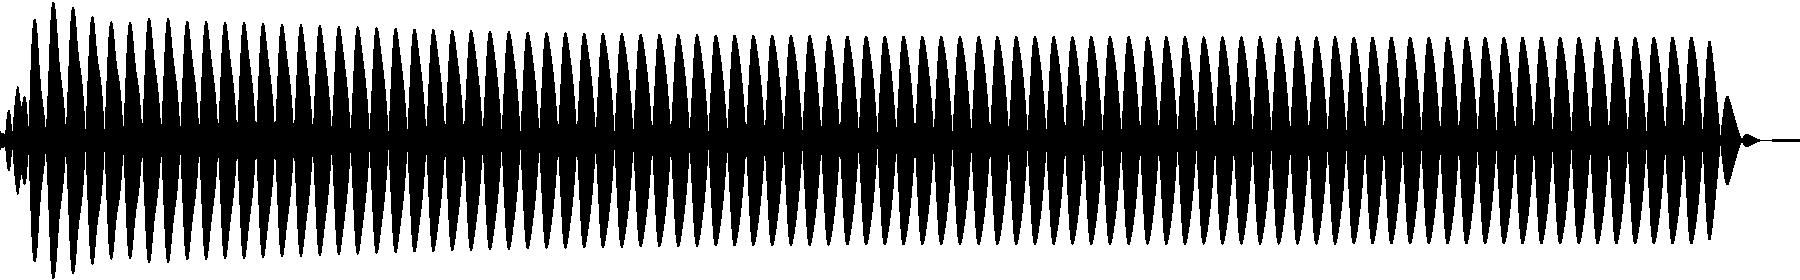 vedh bass cut 023 g